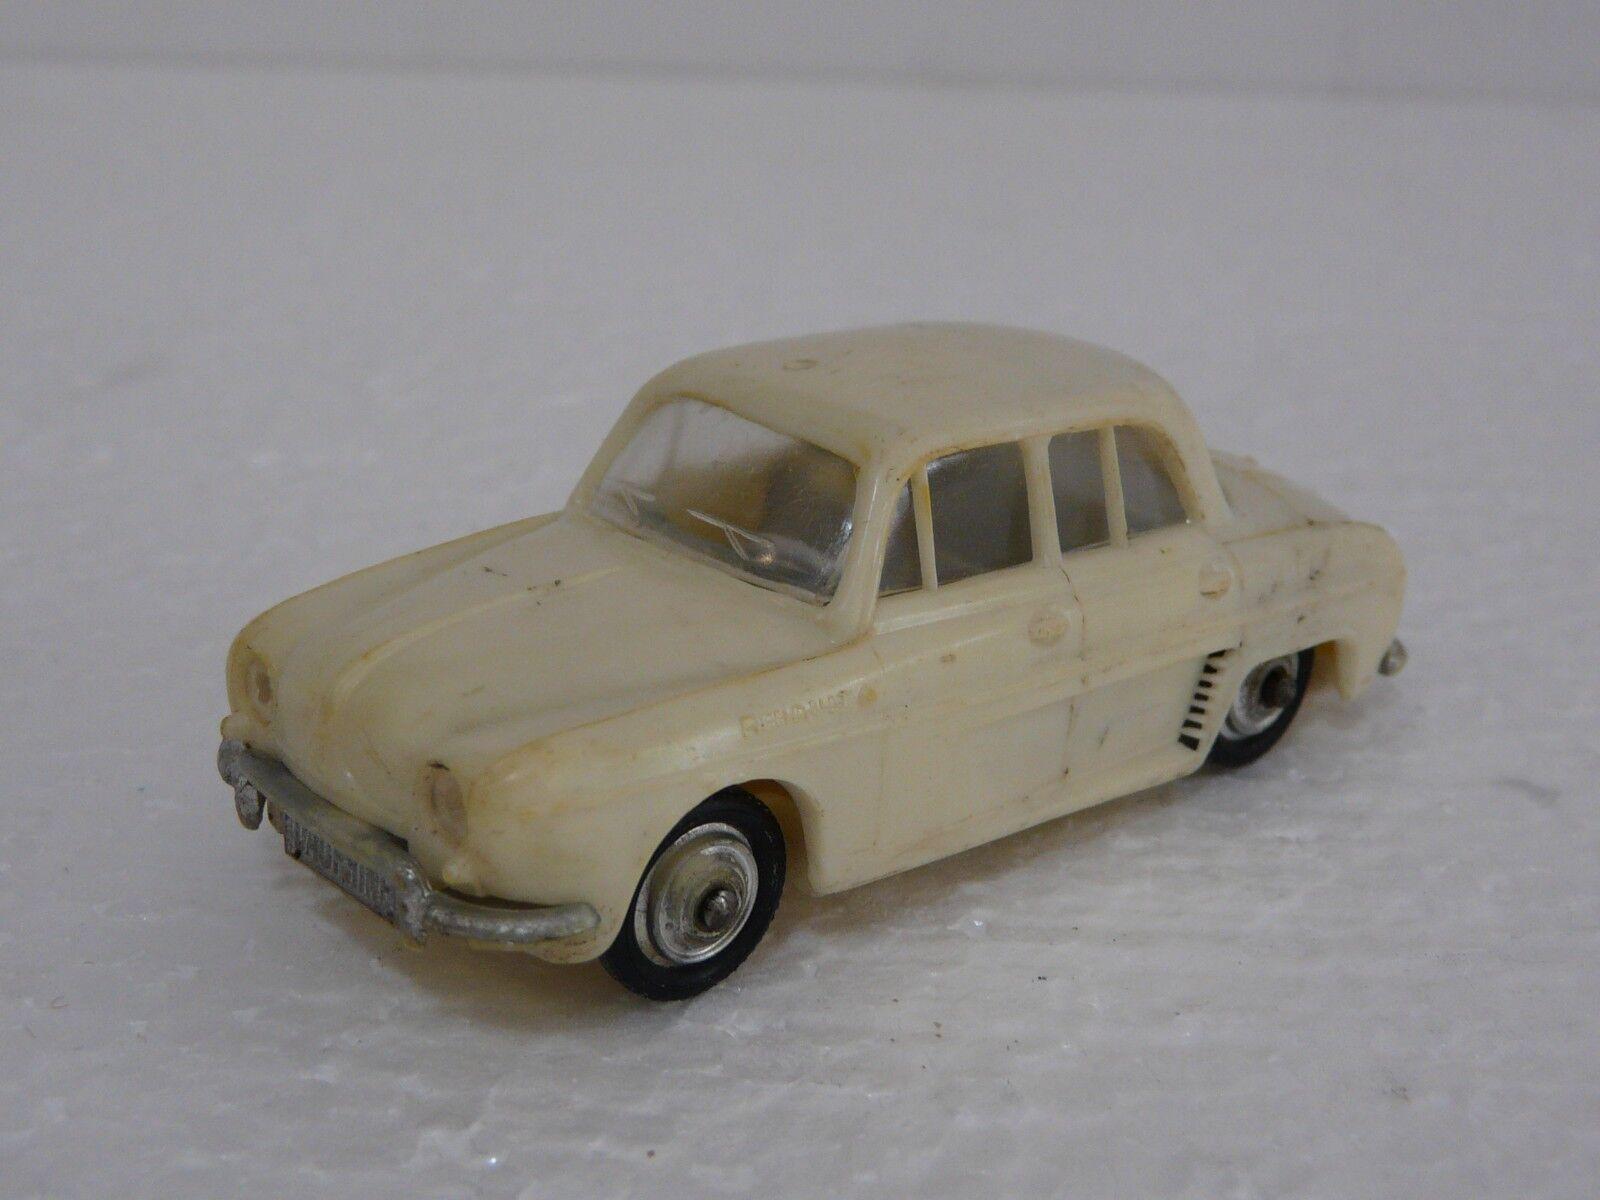 VINTAGE RARE RENAULT DAUPHINE Tbilissi No.2 jouet  voiture made in URSS  magasins d'usine